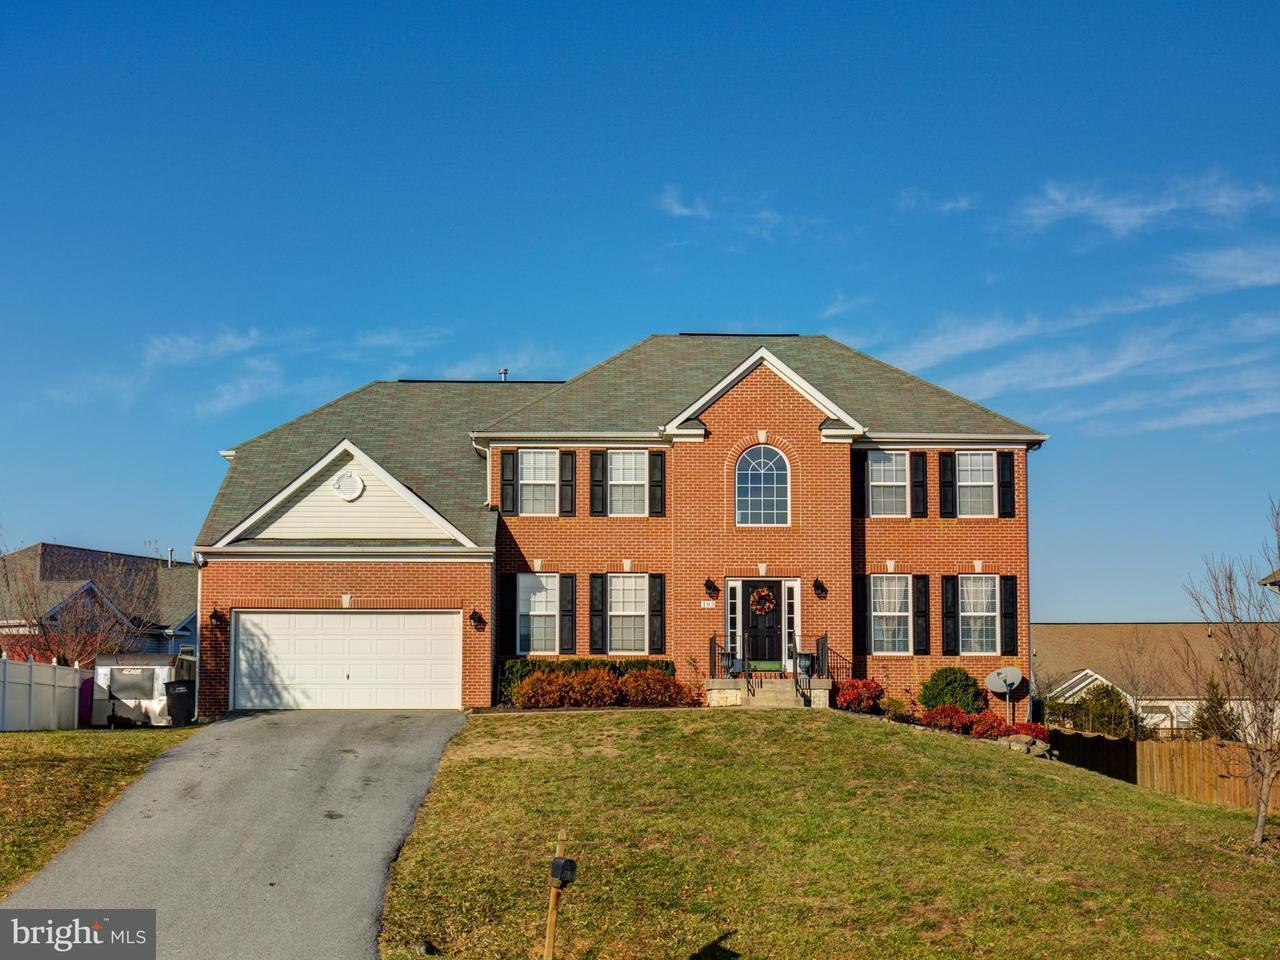 103 Sentry Ct, Winchester, VA \u2014 MLS 1004366115 \u2014 Better Homes and Gardens \u00ae Real Estate